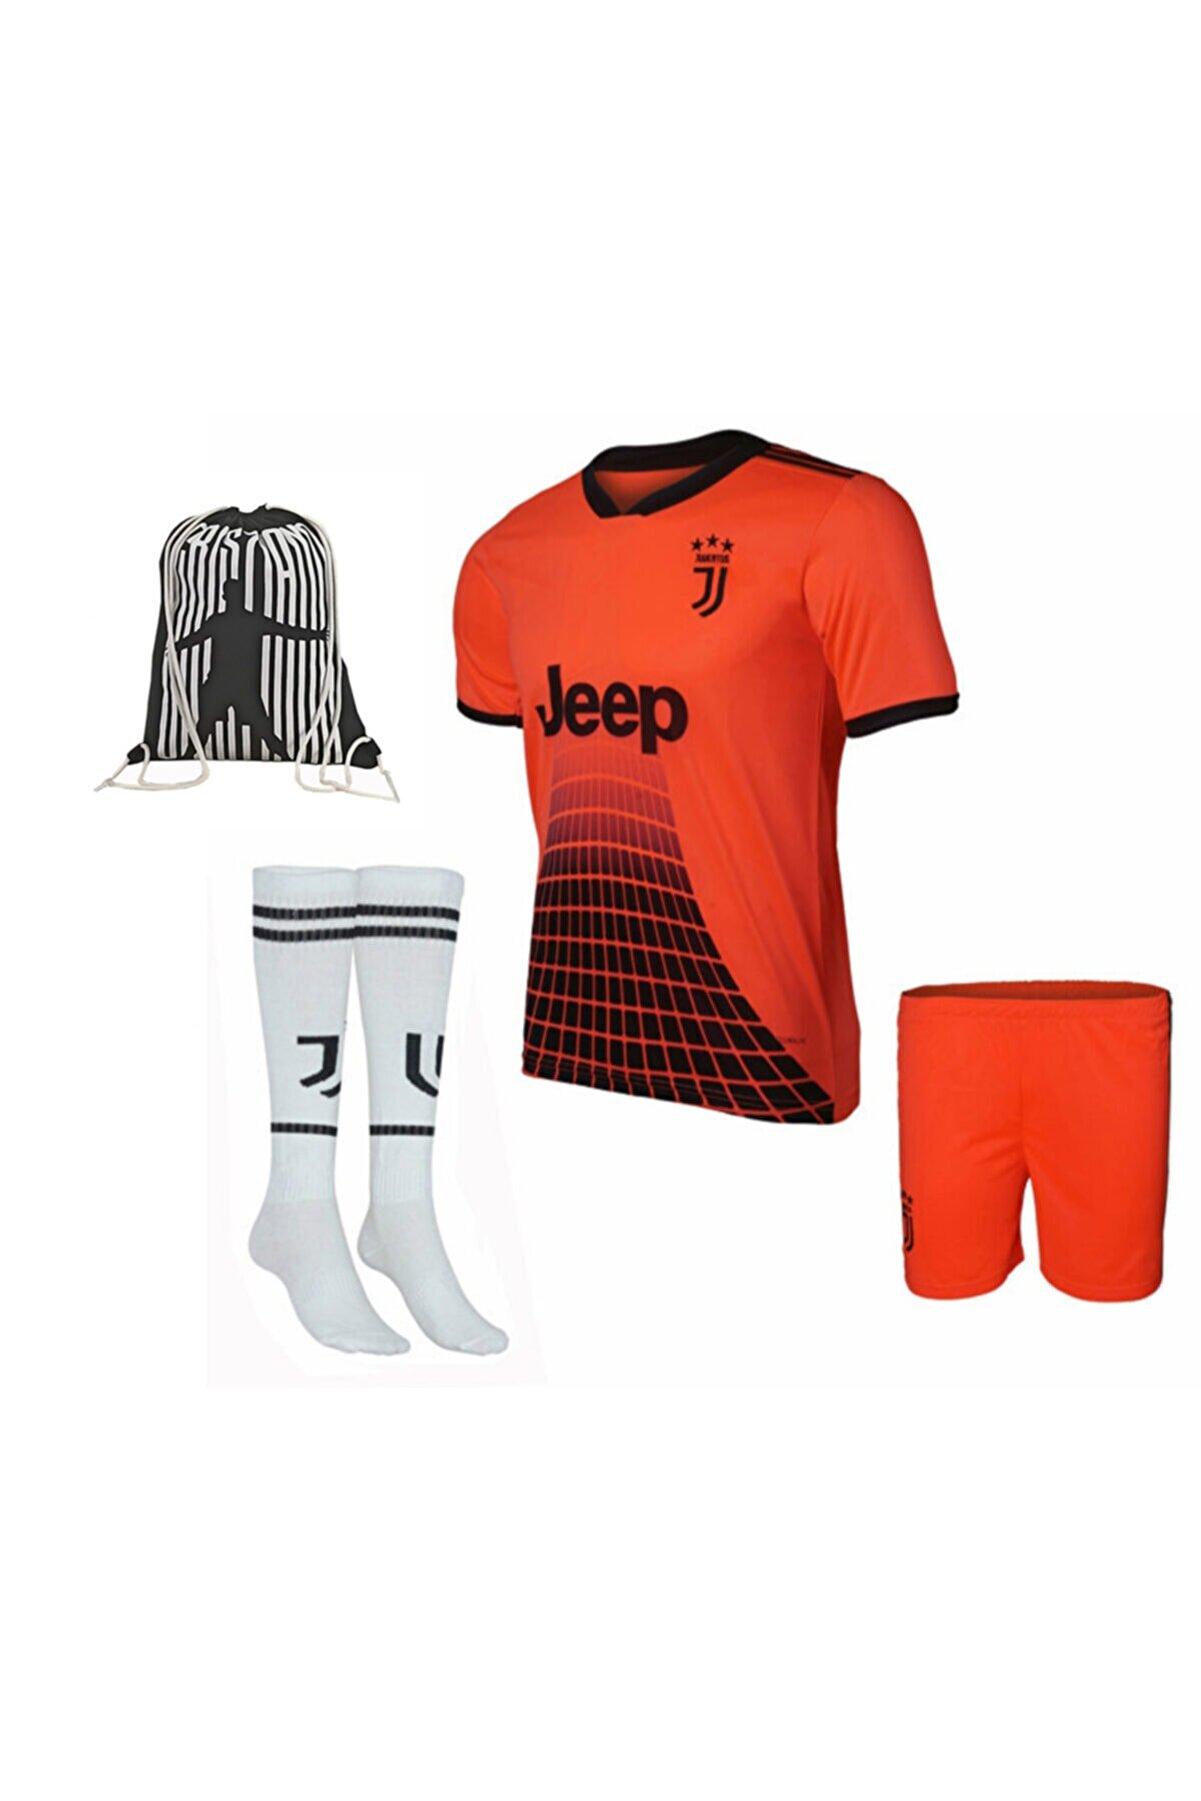 zulema Juventus Ronaldo Çocuk Forma Şort Çorap Ve Çanta Floresan Oranj